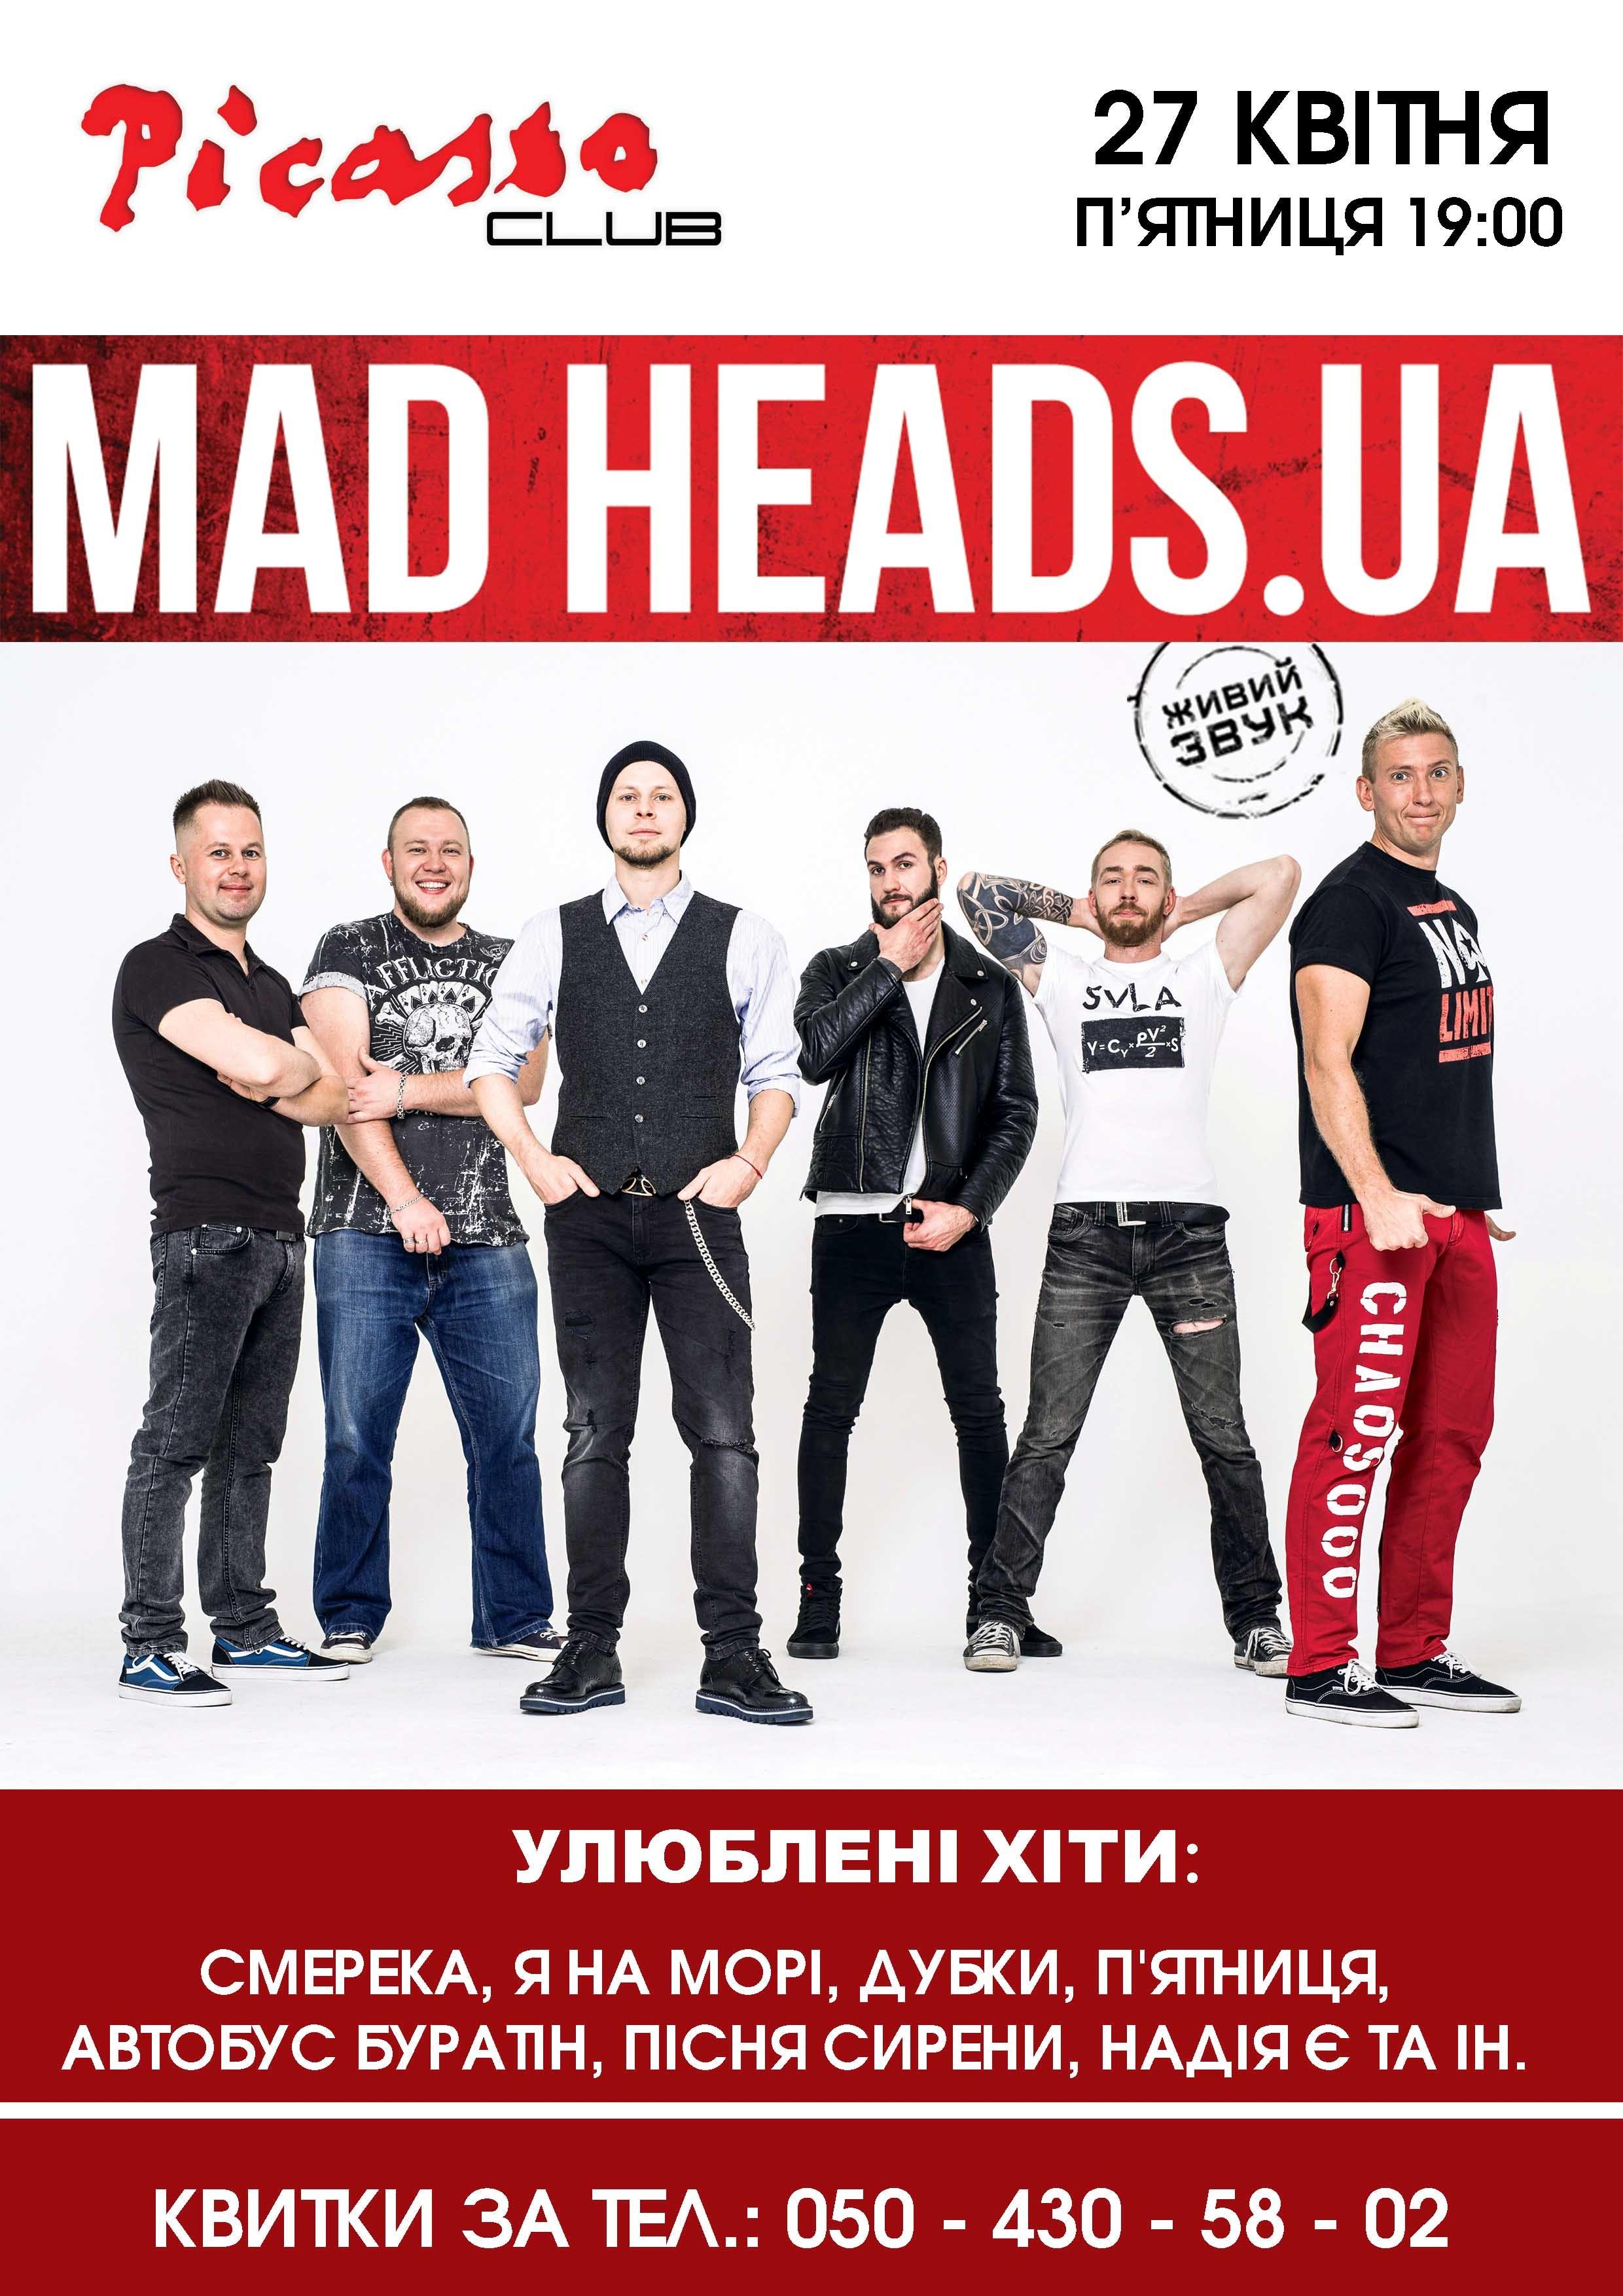 MAD HEADS (Мед Хедс)- скасовано!